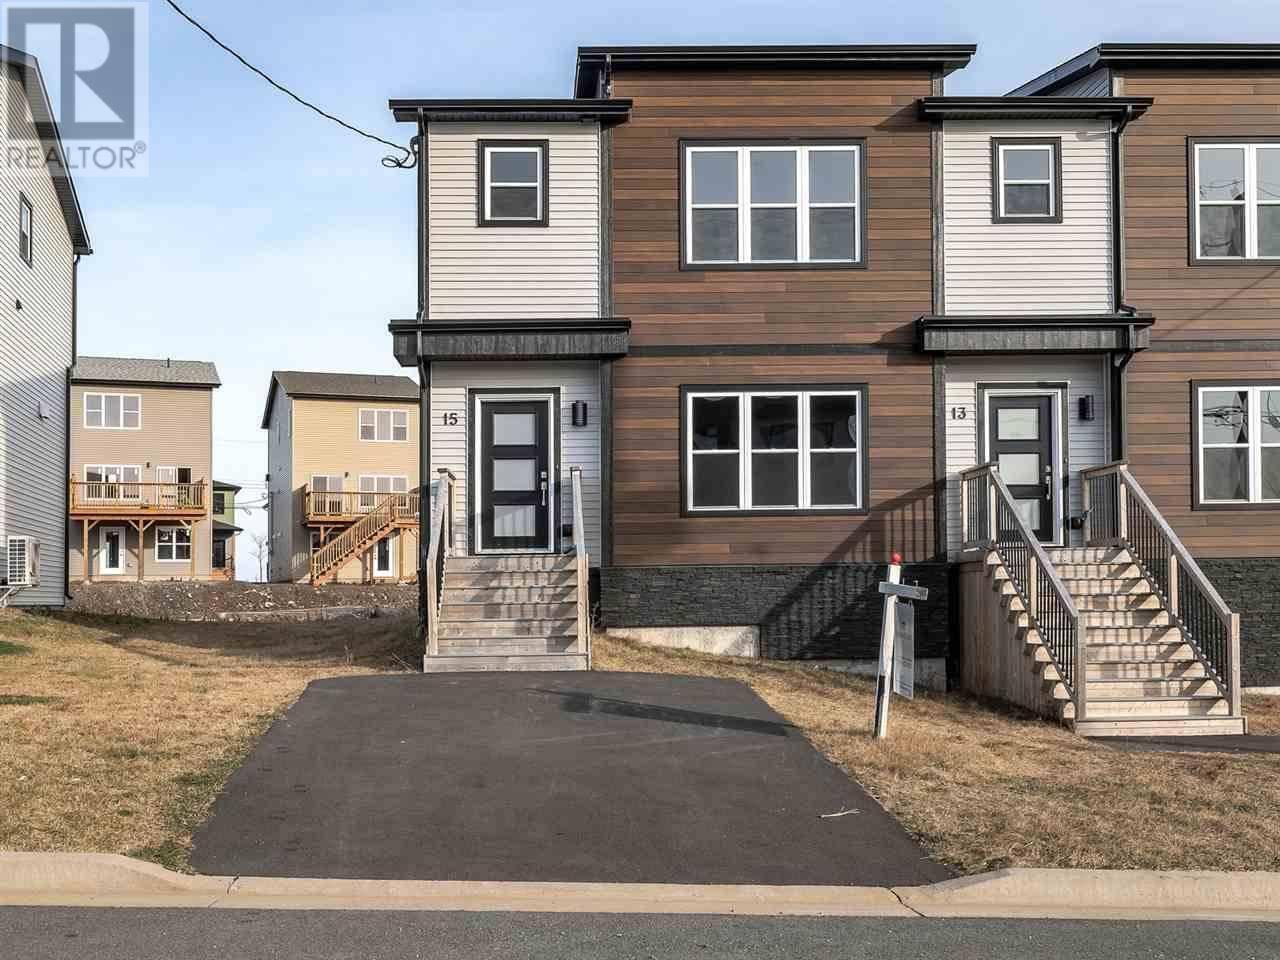 House for sale at 15 Travertine Ct Halifax Nova Scotia - MLS: 201809135